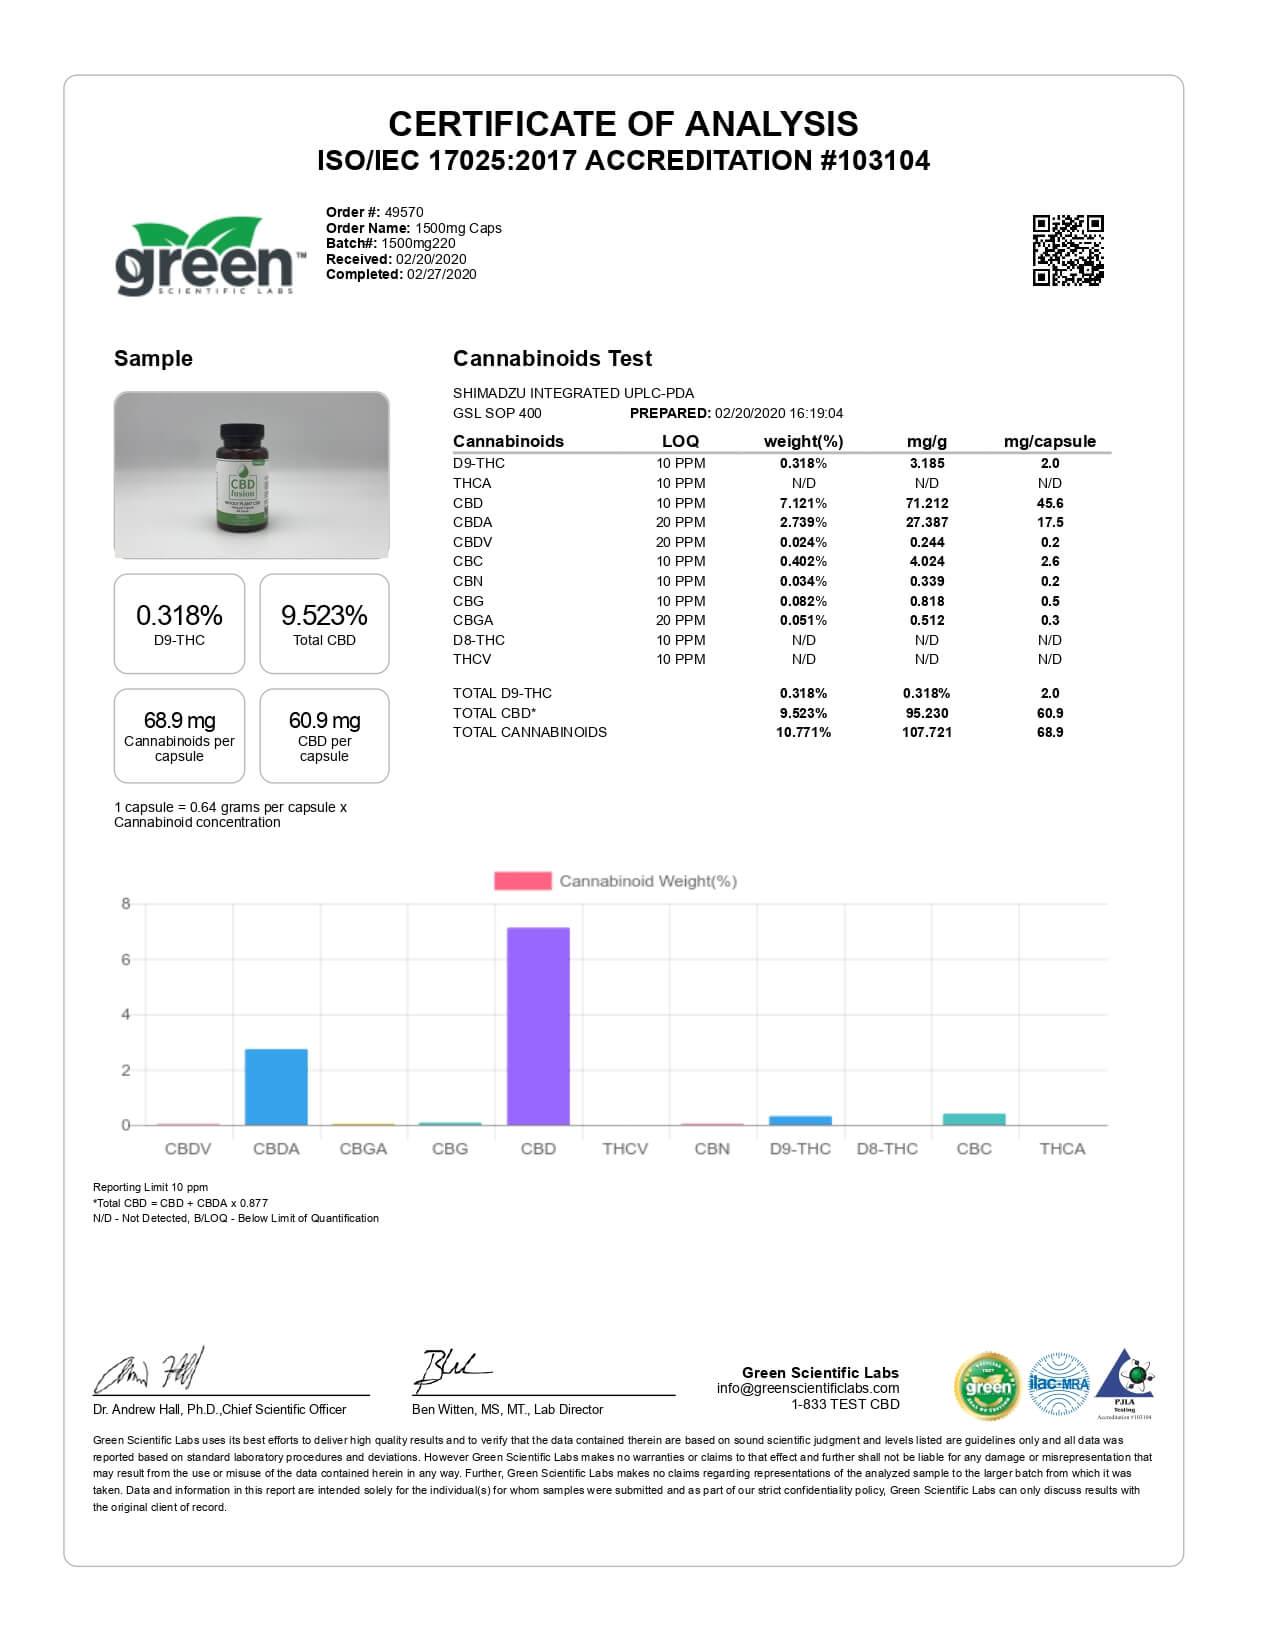 CBD Fusion Whole Plant Caps Lab Report 1500mg